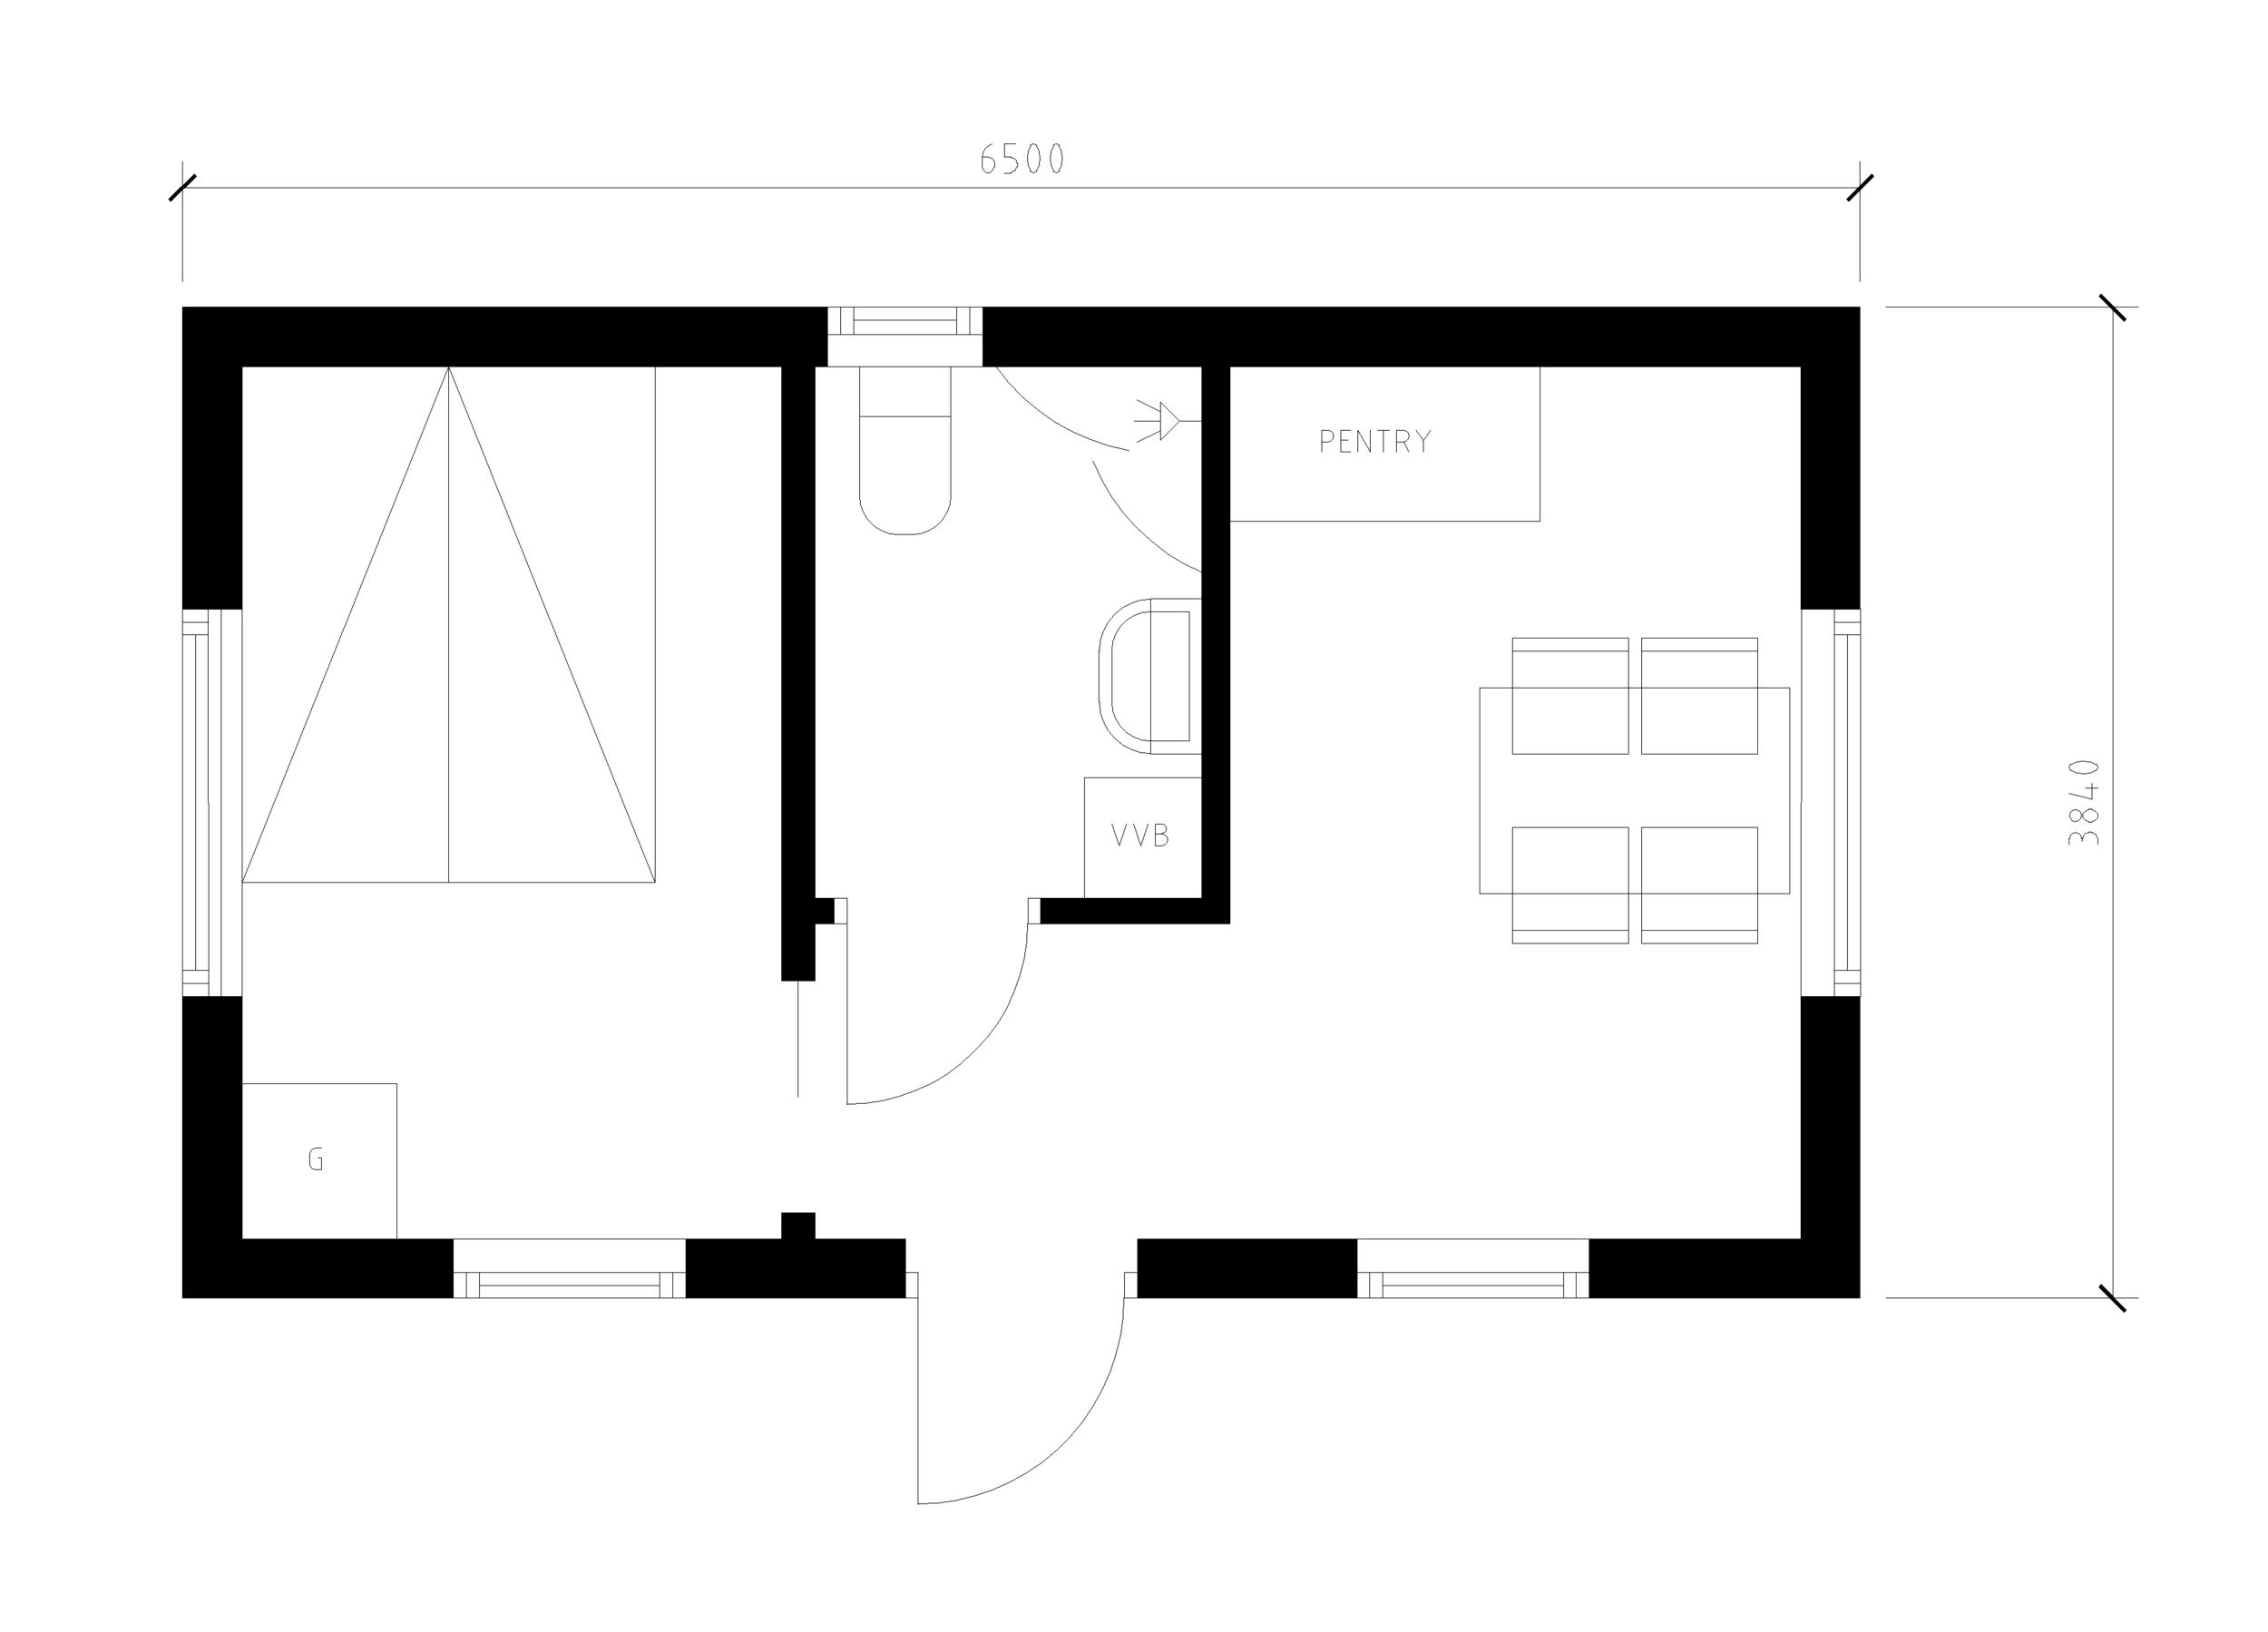 easy-house-attefallshus-åhus-25-sovrum-badrum-kök-allrum-planlösning-2